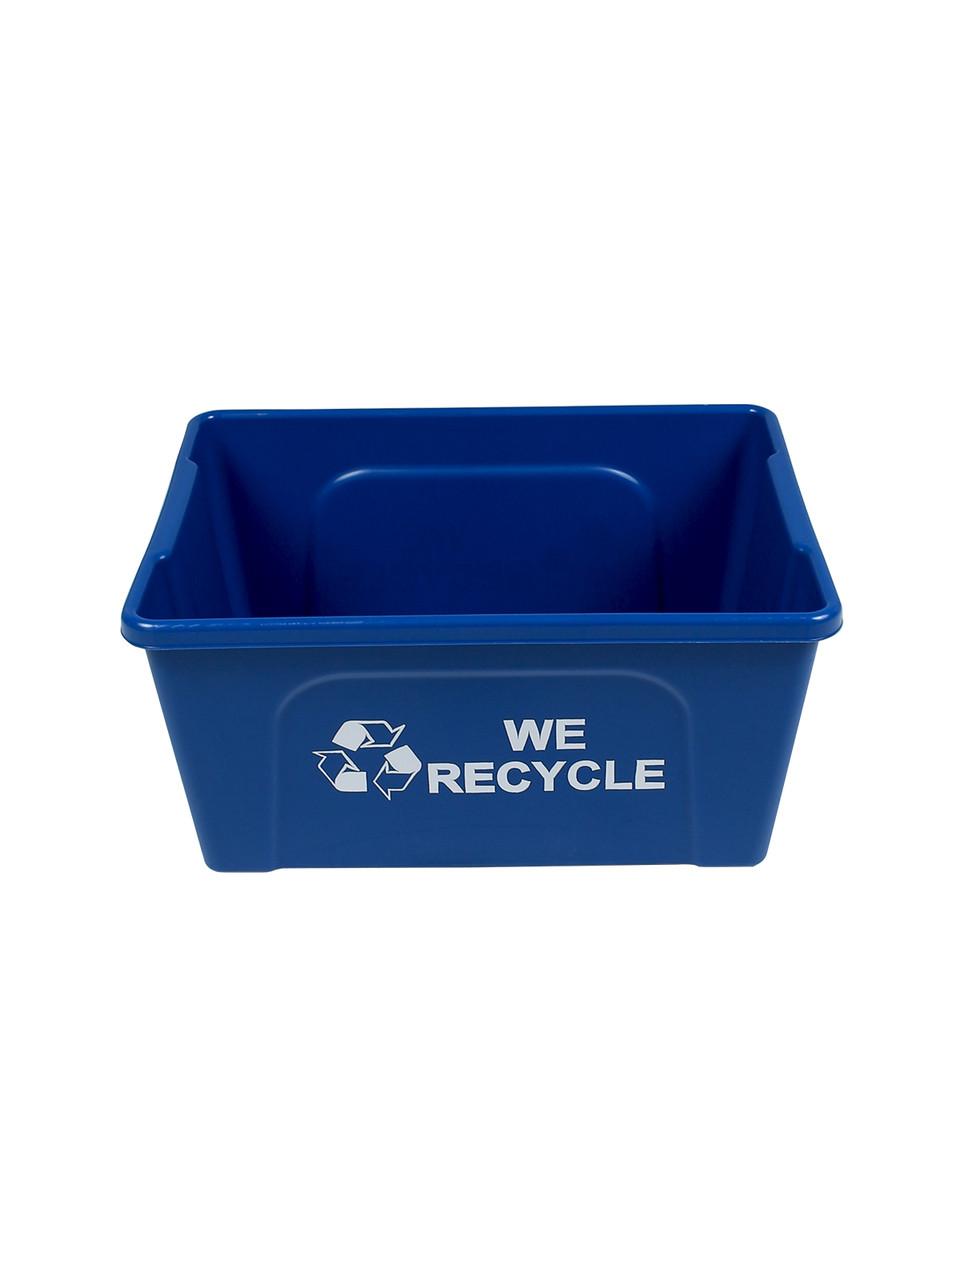 3 Gallon WE RECYCLE Blue Deskside Paper Bin BC1001-01WR